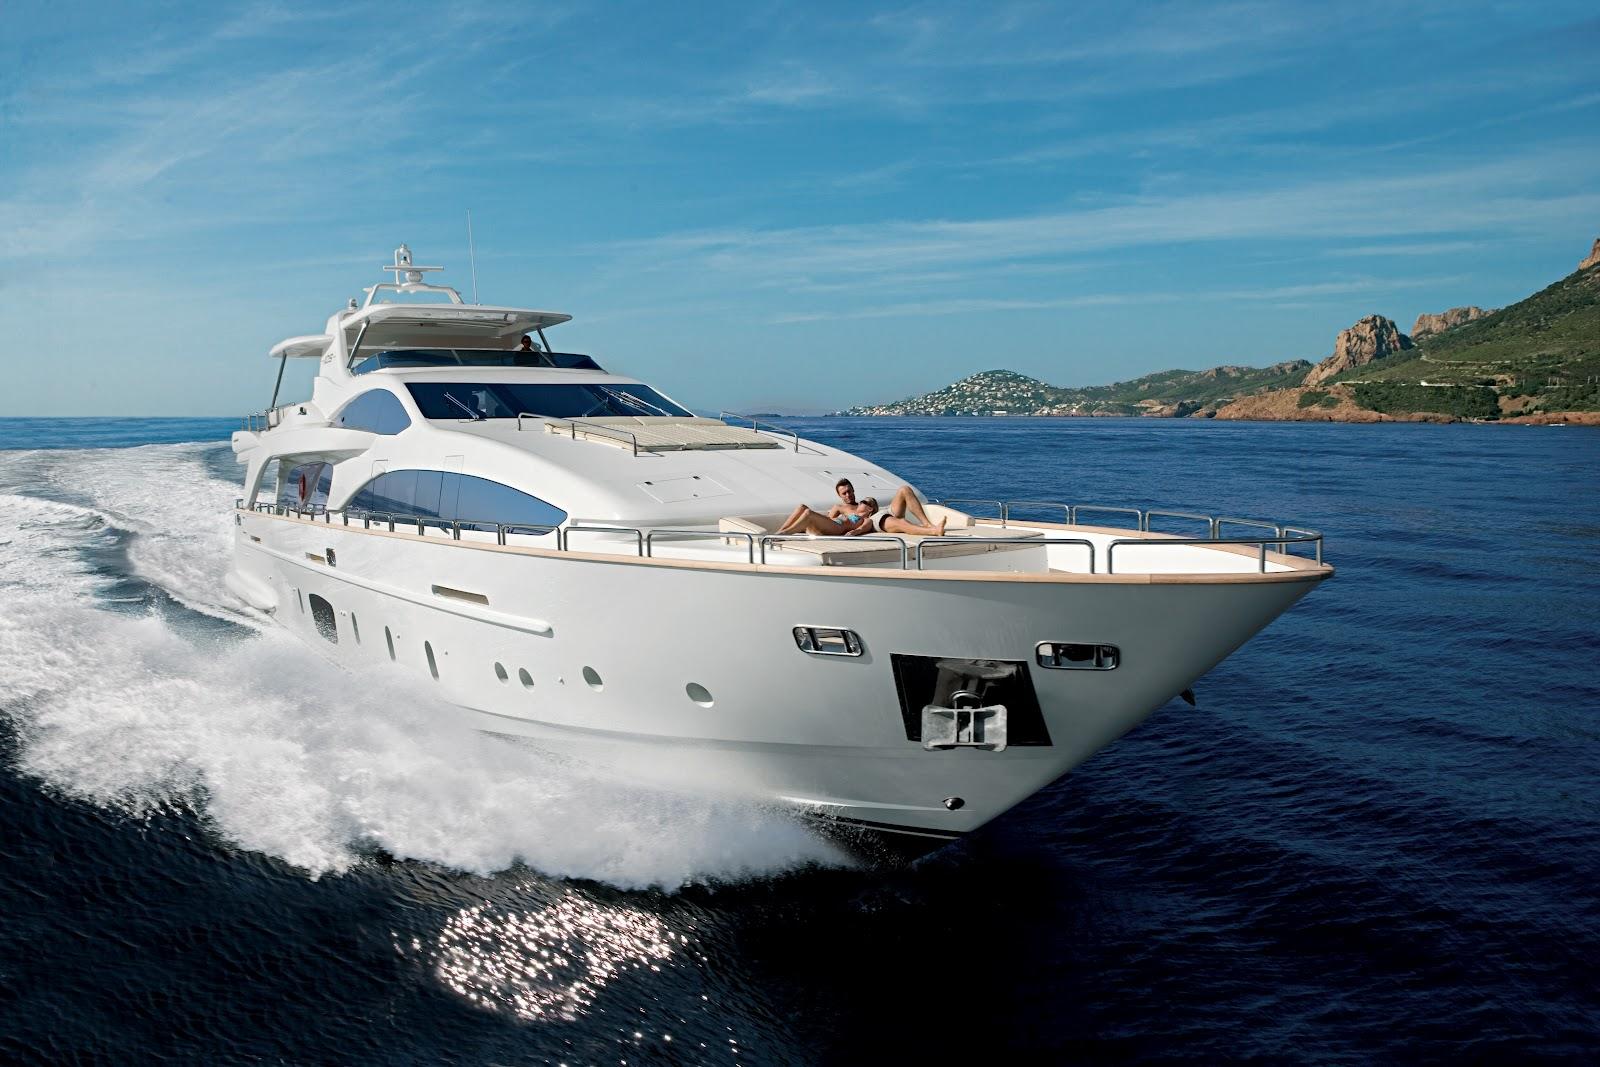 http://1.bp.blogspot.com/-LeUpZk55L5s/UFnCtNZkkrI/AAAAAAAABh8/-HN4Ug5SKas/s1600/Azimut-105-luxury-motor-yacht.jpg